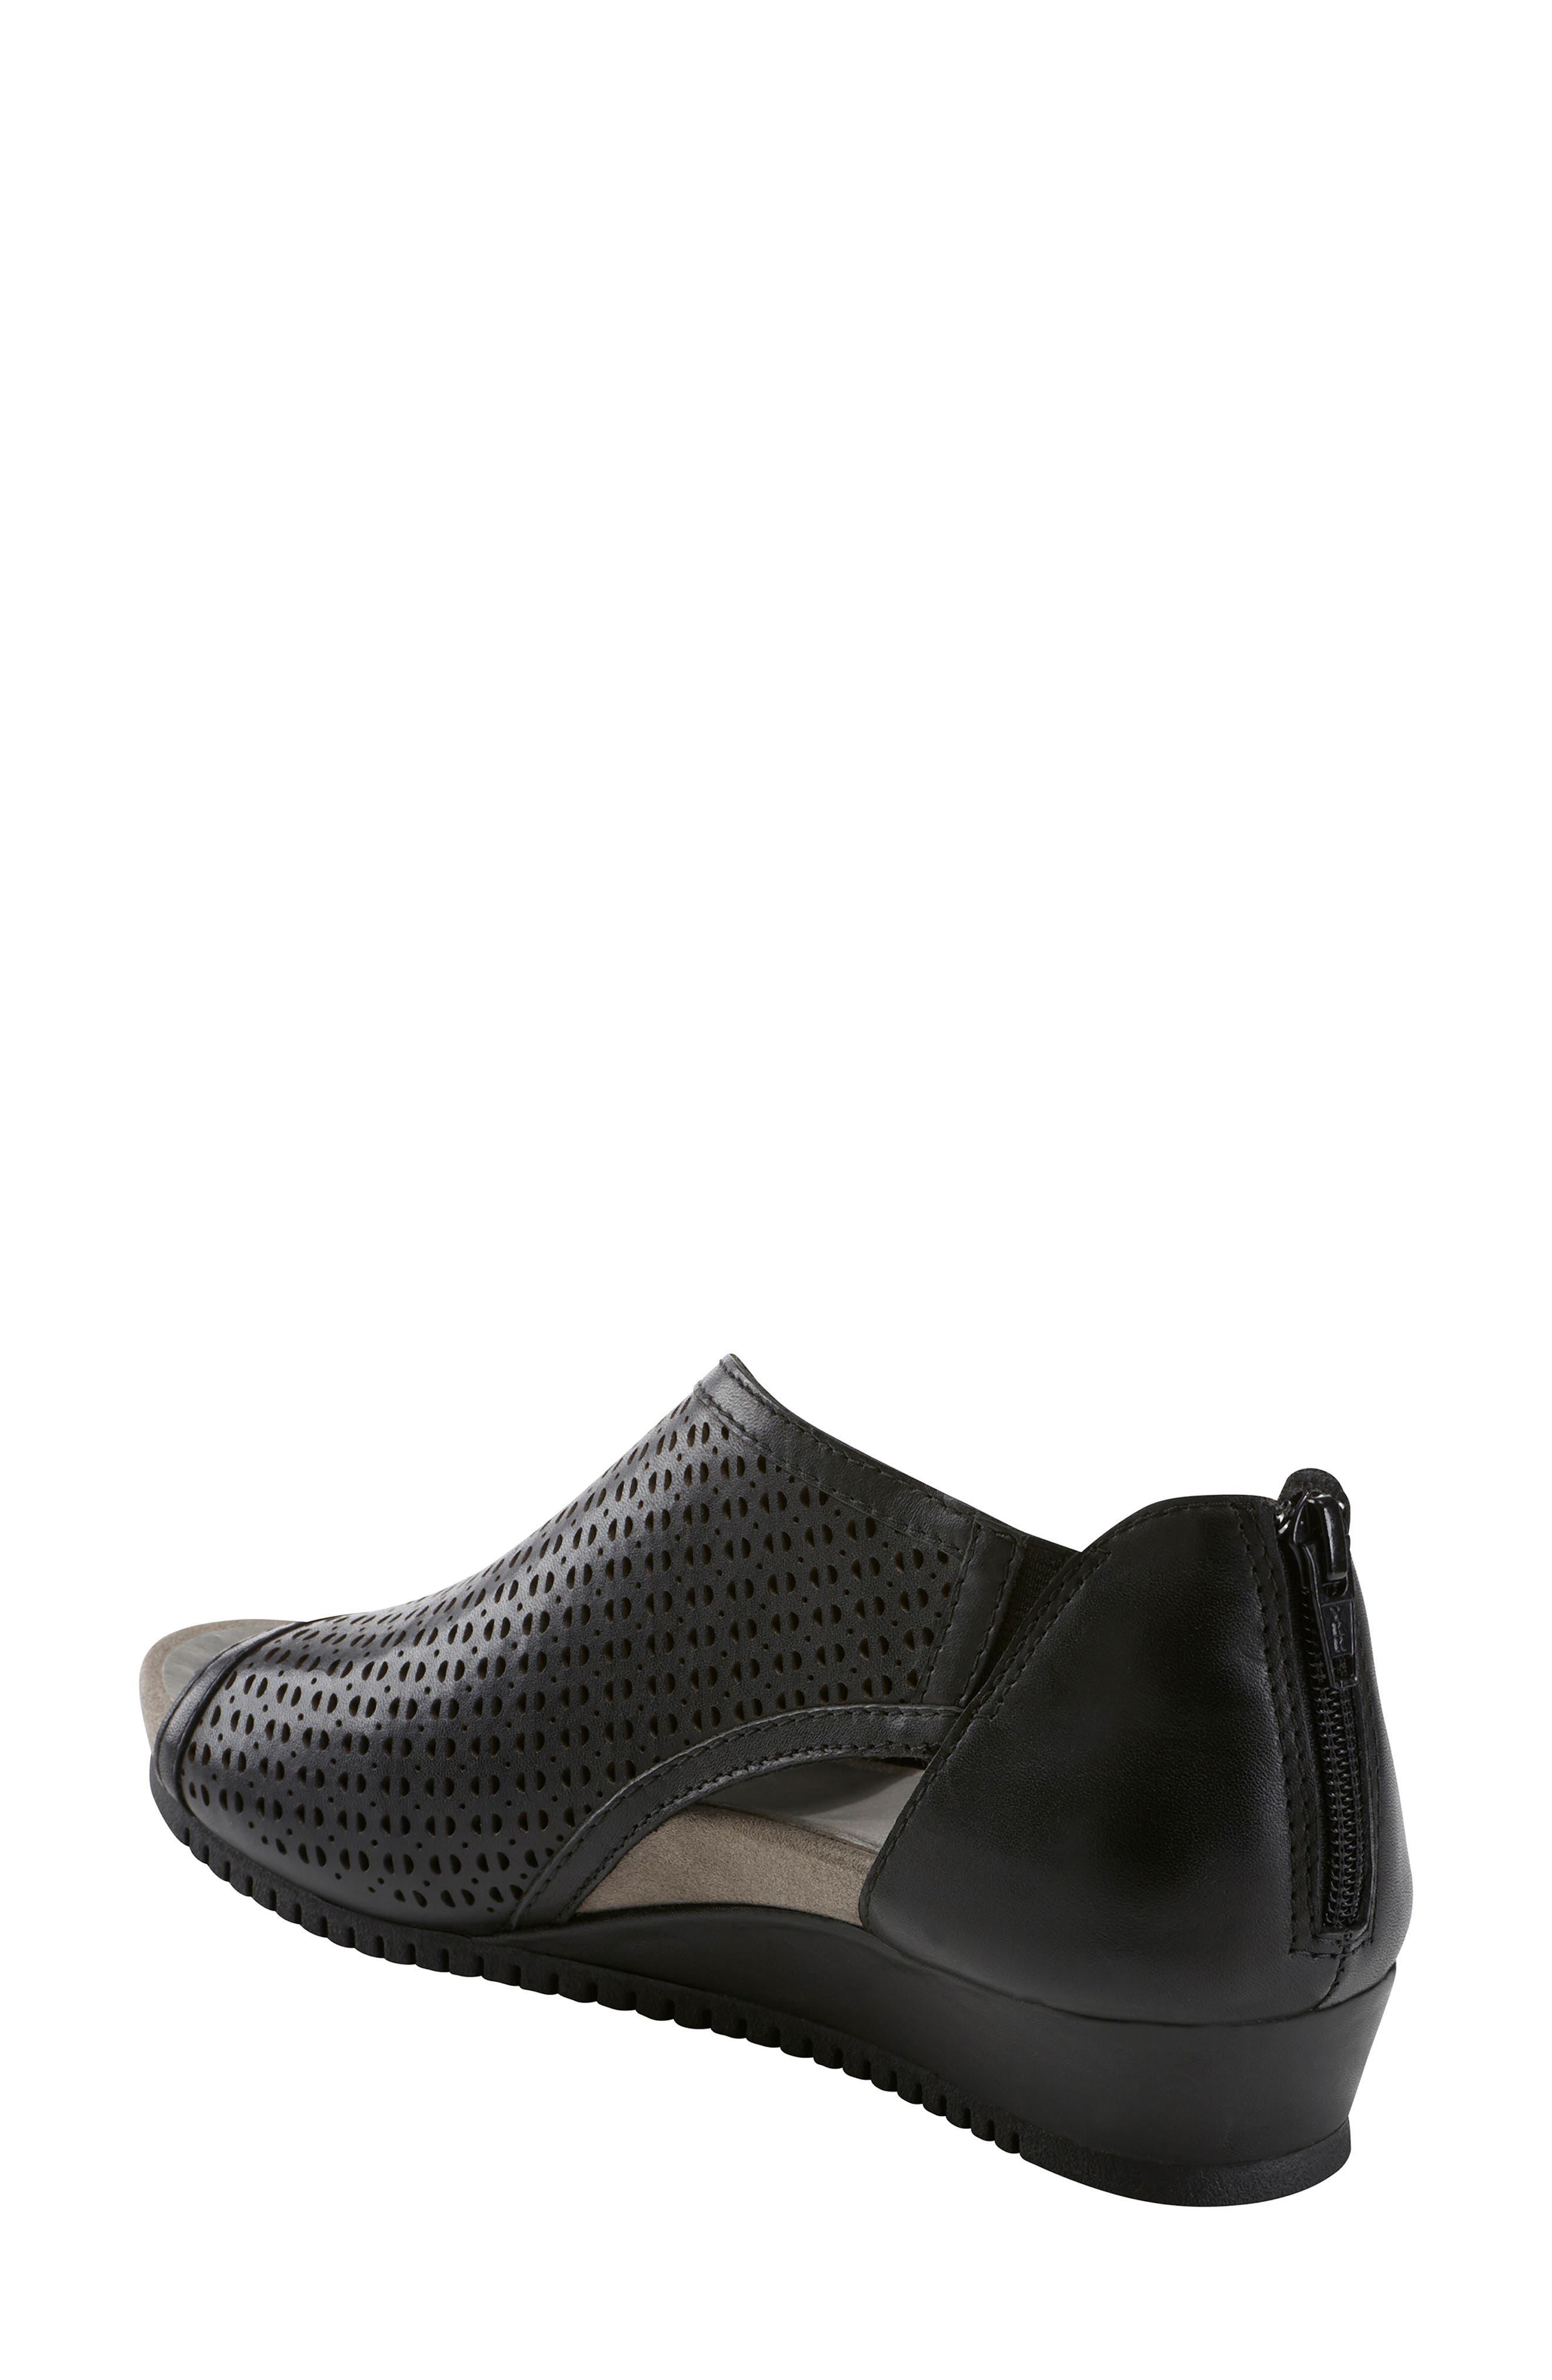 Capricorn Wedge Sandal,                             Alternate thumbnail 2, color,                             BLACK LEATHER